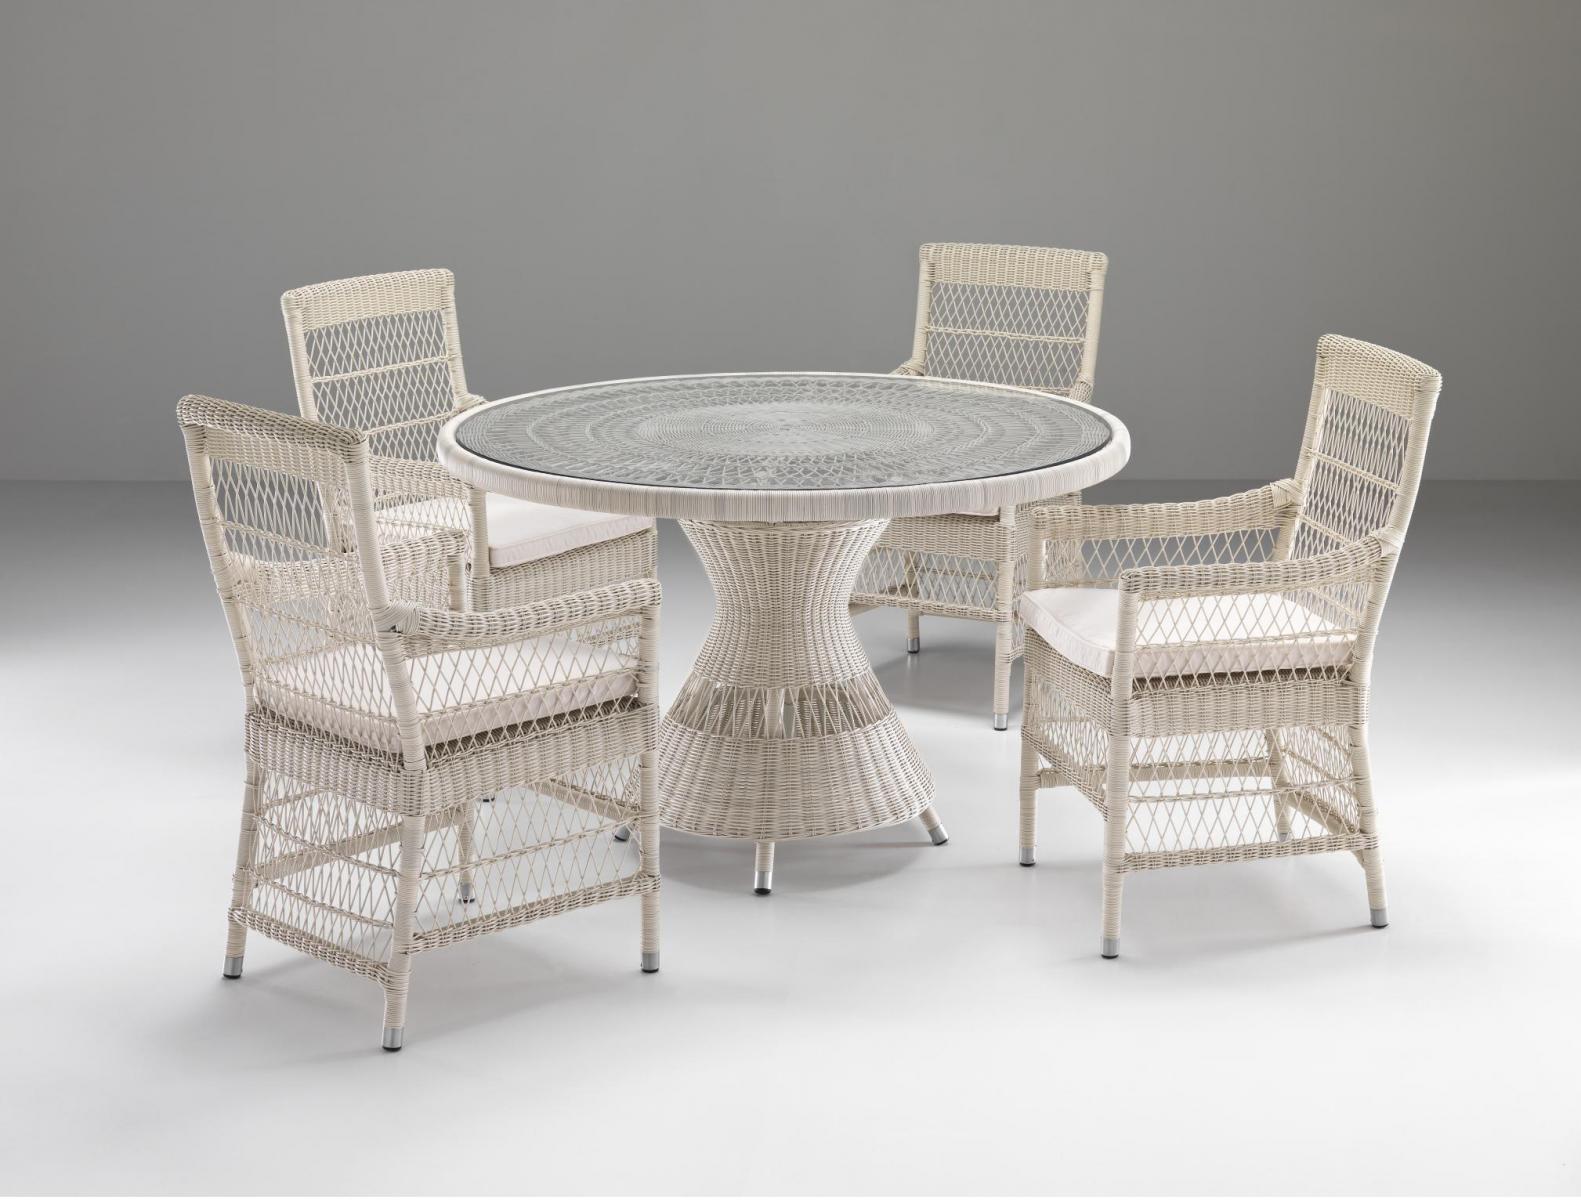 Стол плетеный со стеклом Camille